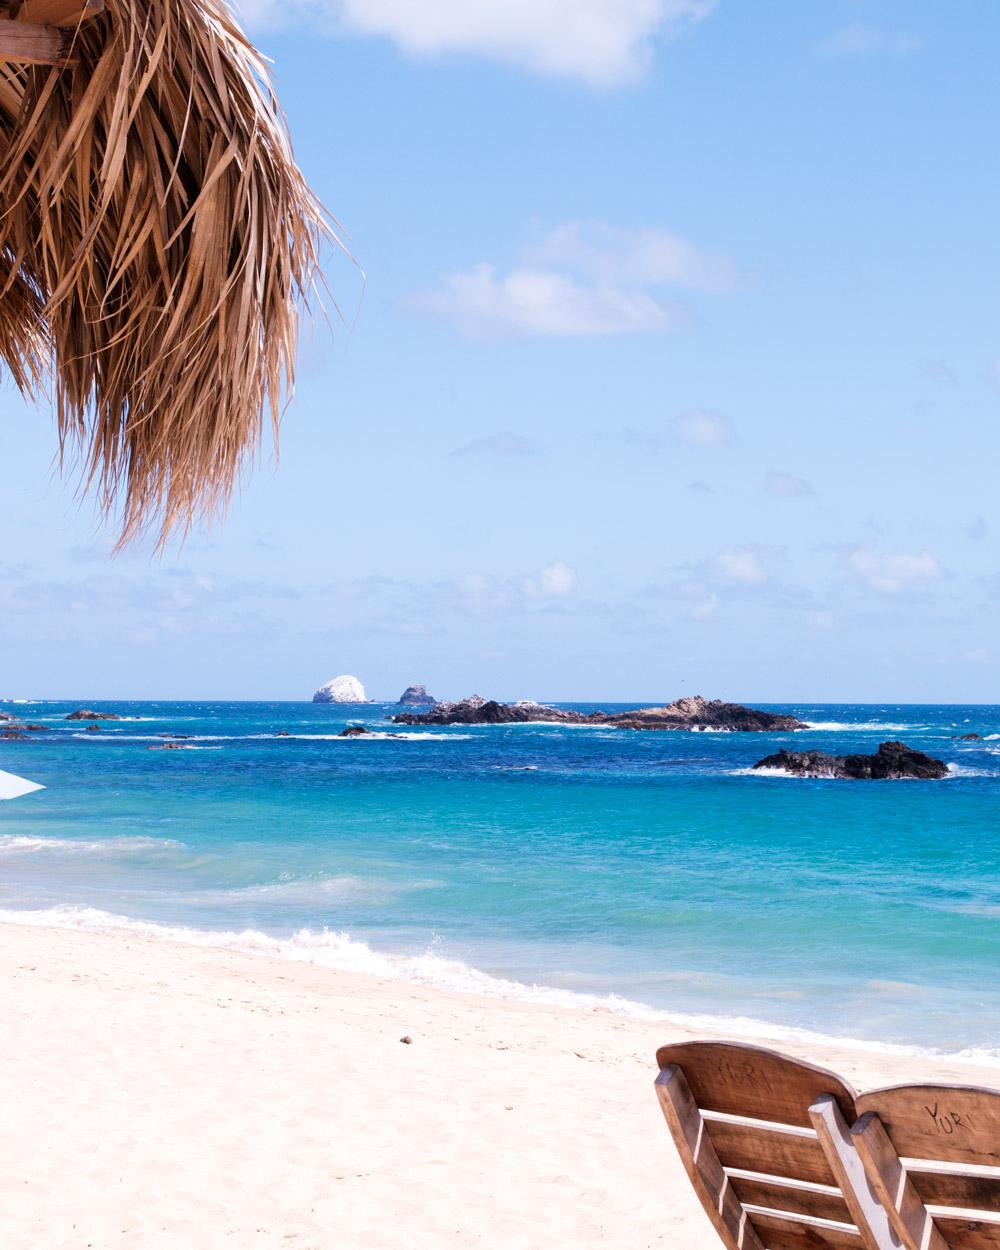 Playa Mazunte - stunning beach